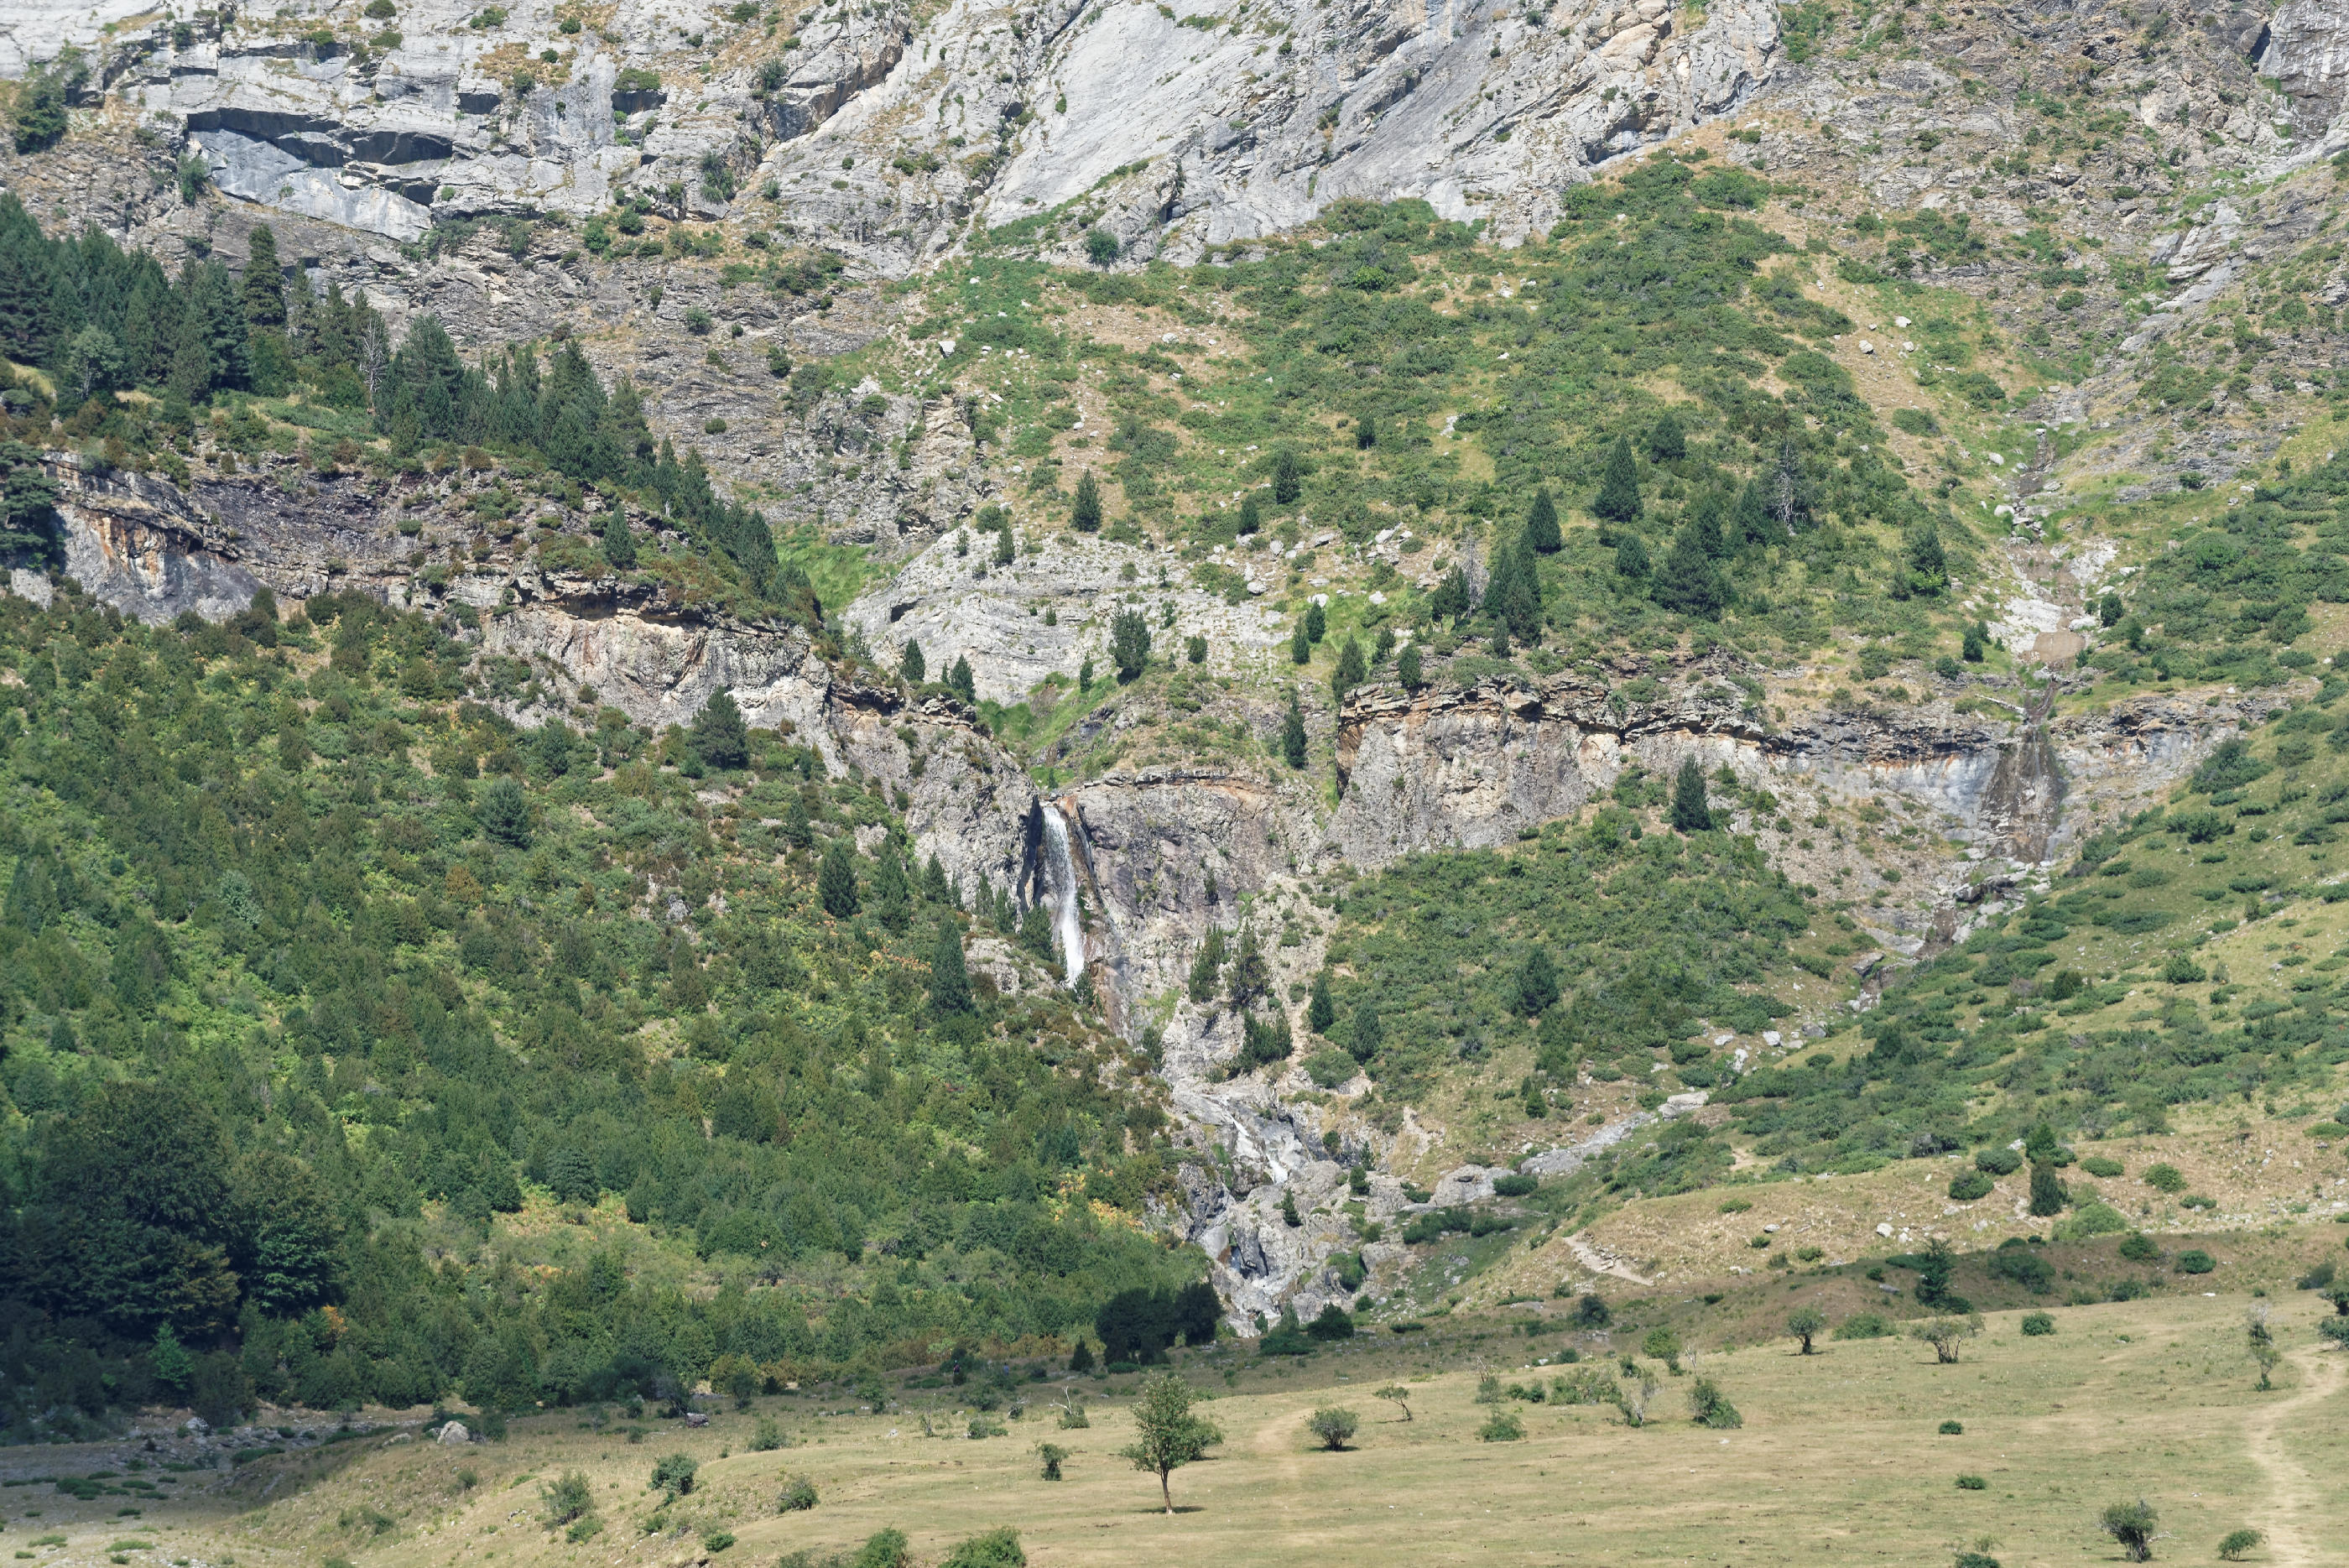 160910-marche-cascade-du-cinca-et-de-la-larri-sobrarbe-aragon-174